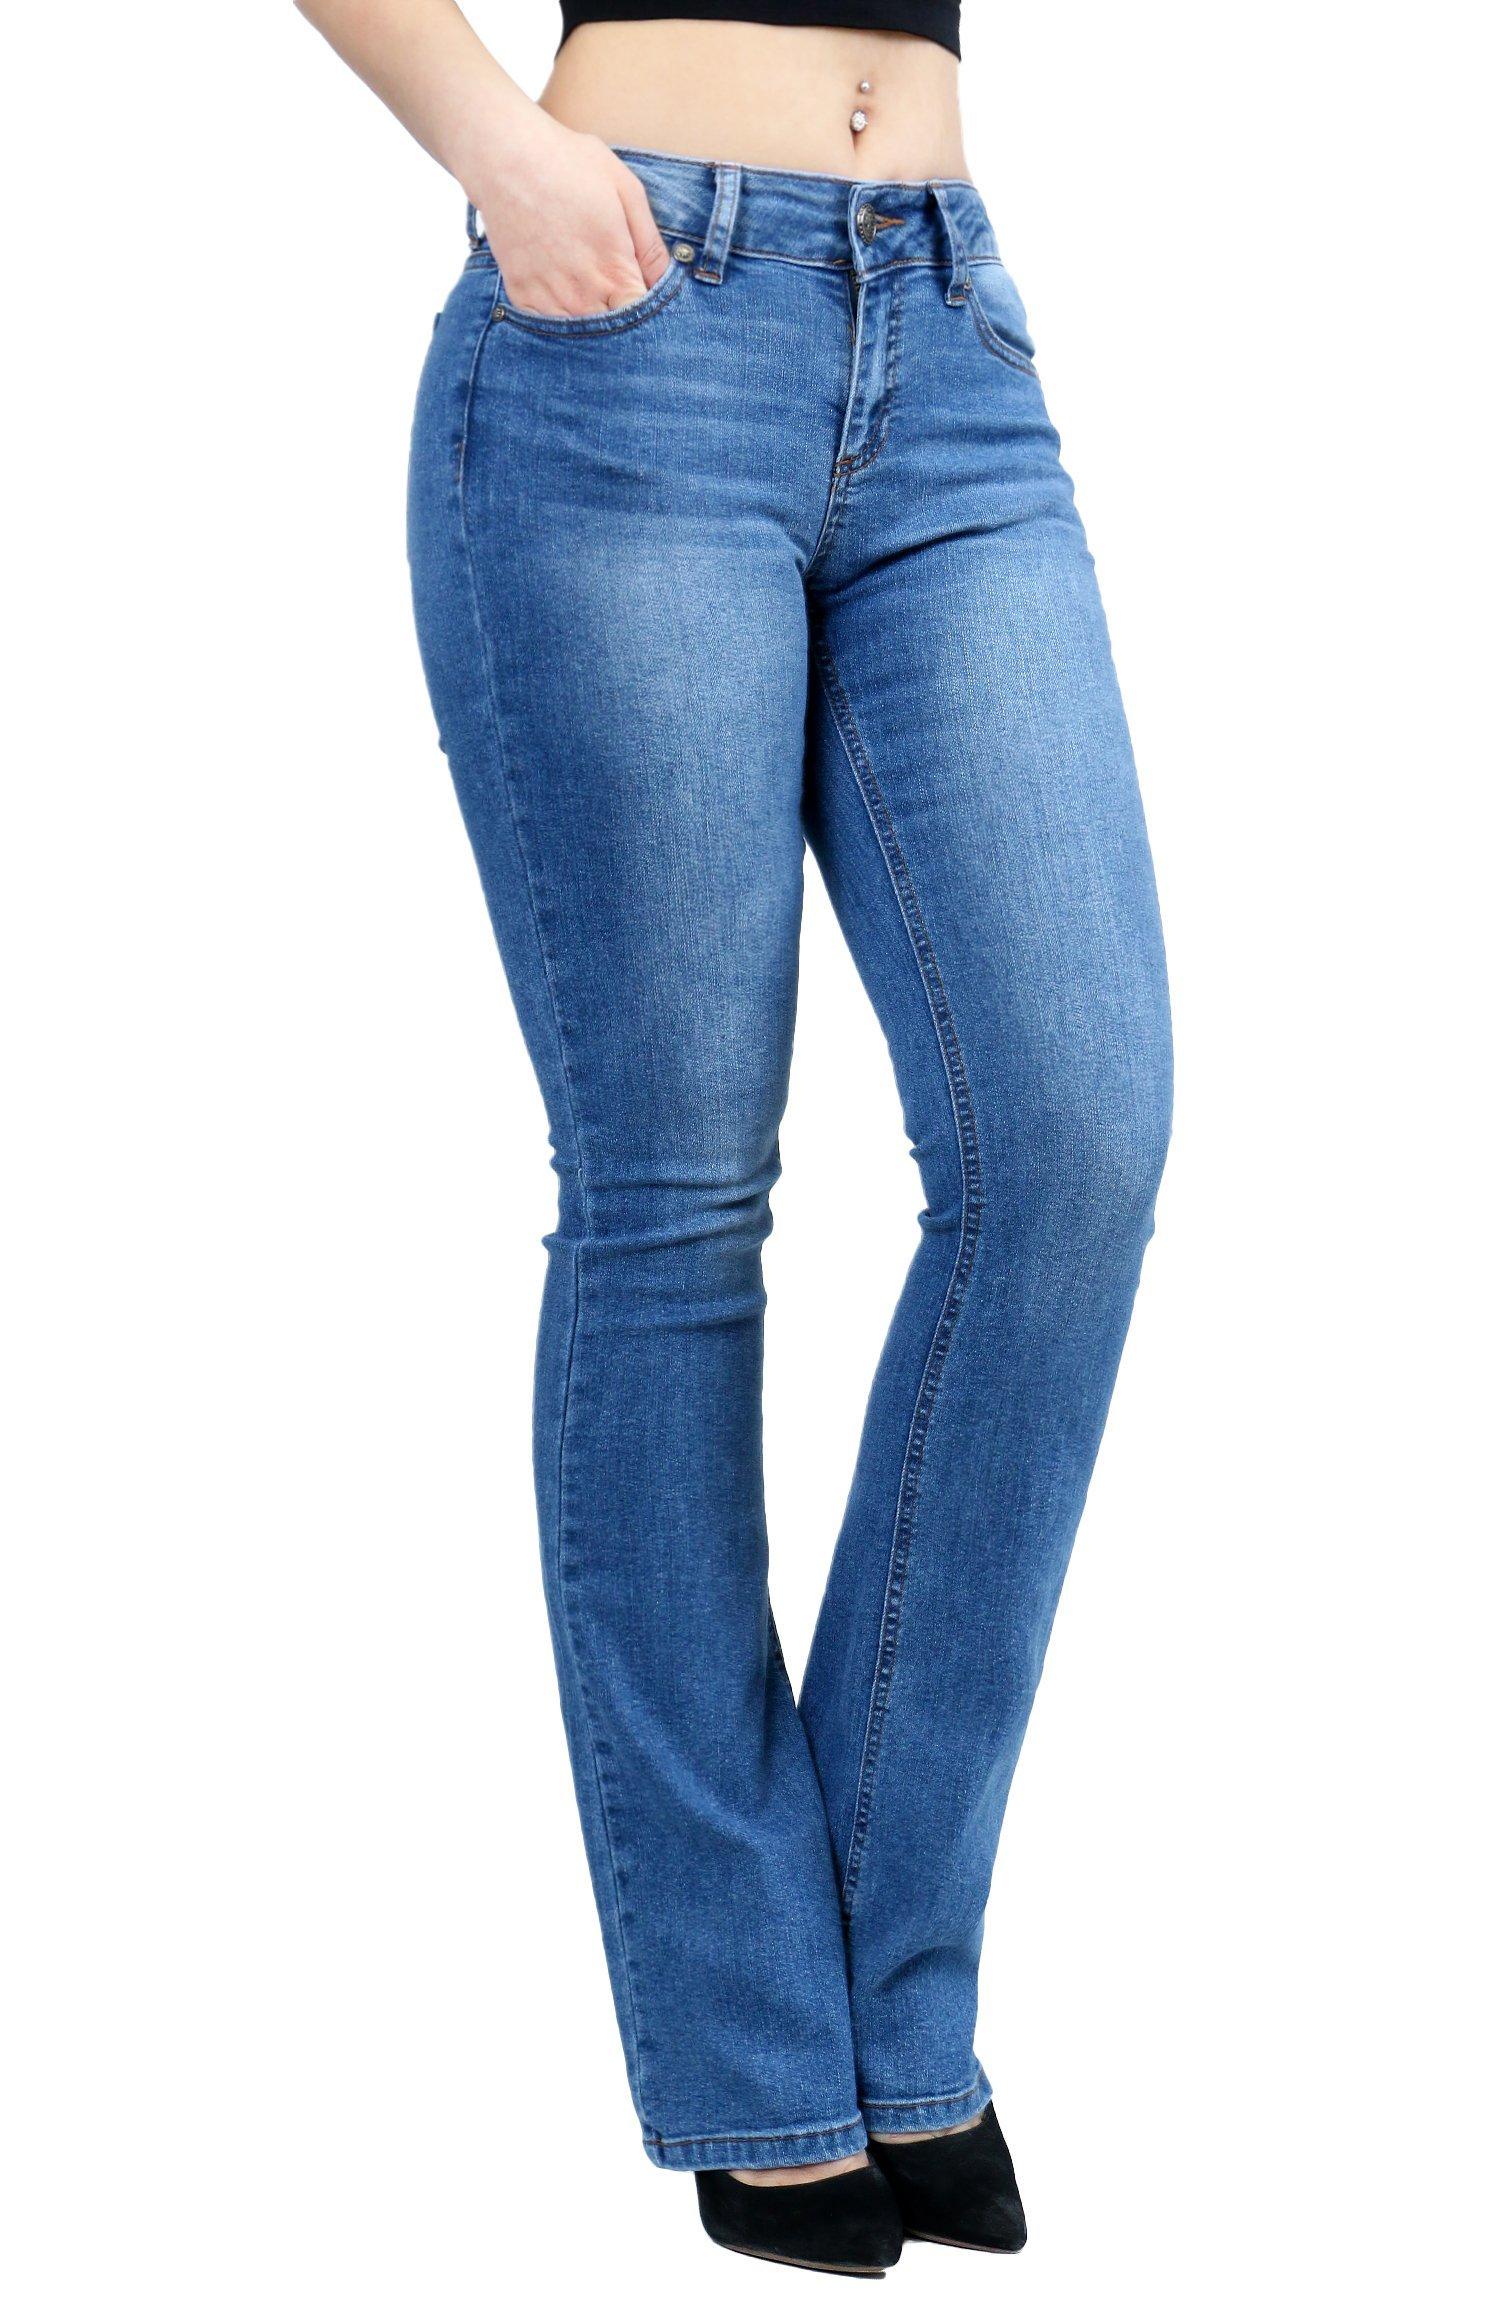 Women Fashion Trendy Sexy High Waisted Stylish Flare Bell Bottom Jean SIZE-3 DENIM-91000